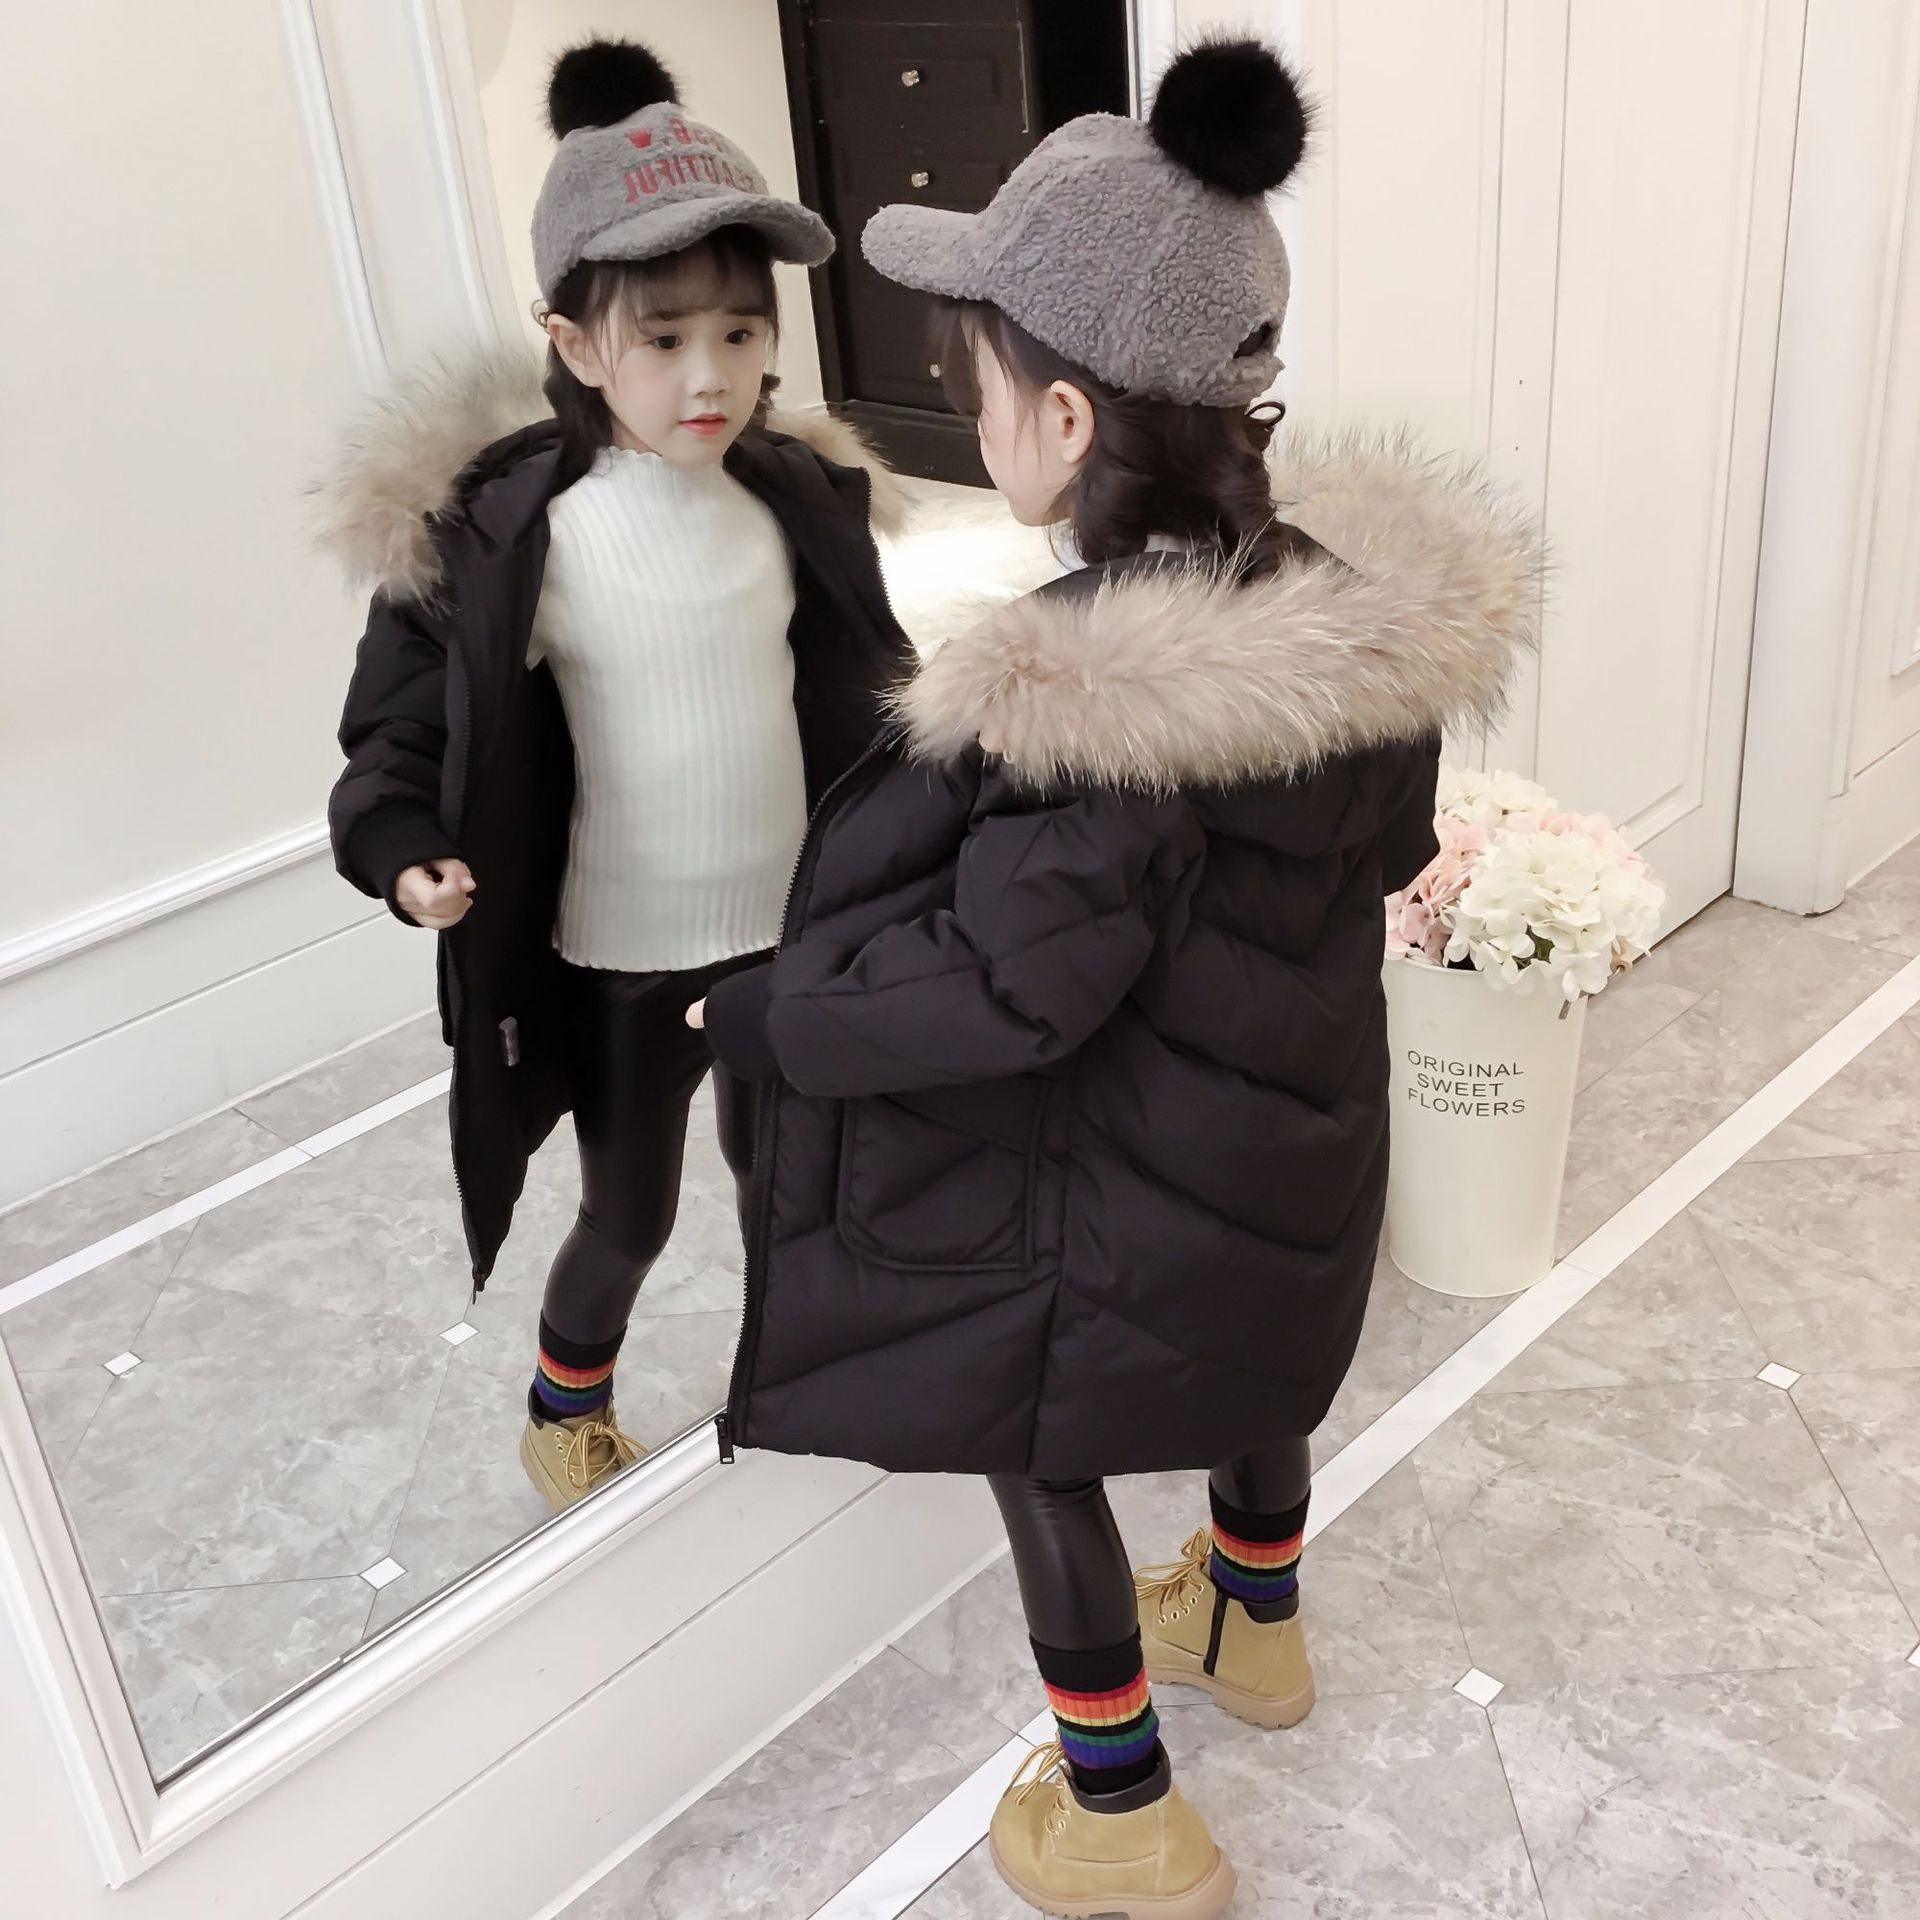 Girls Coats Winter Korean Wool Collar Long Cotton Padded Outerwear Fashion Girl Jackets 5-10 YearsGirls Coats Winter Korean Wool Collar Long Cotton Padded Outerwear Fashion Girl Jackets 5-10 Years